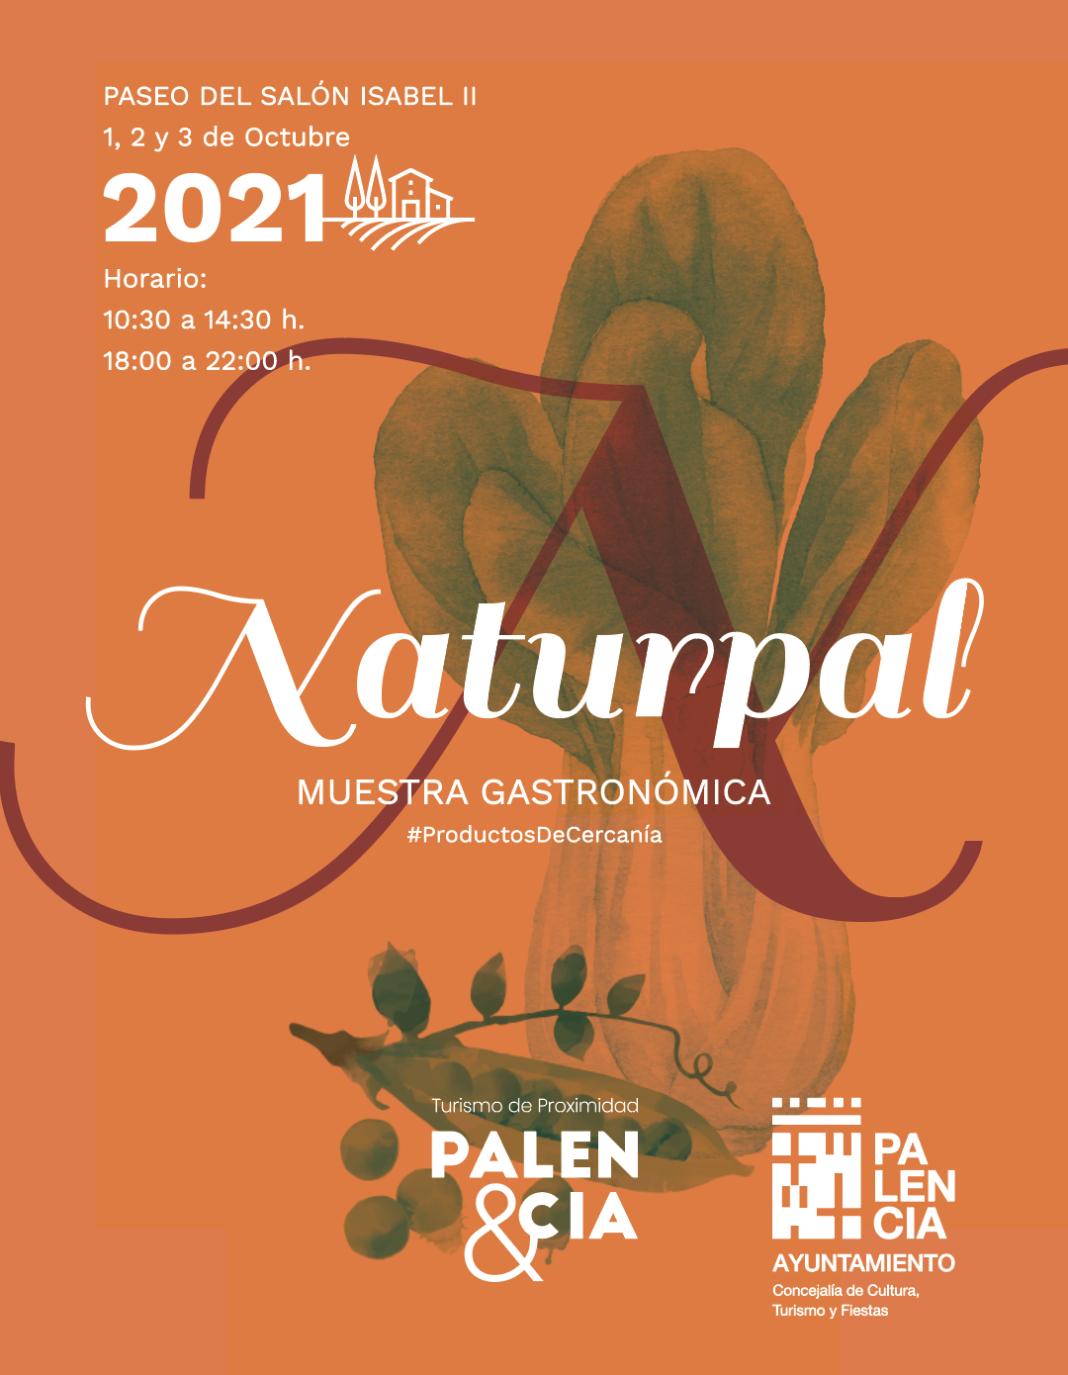 programa de la feria naturpal